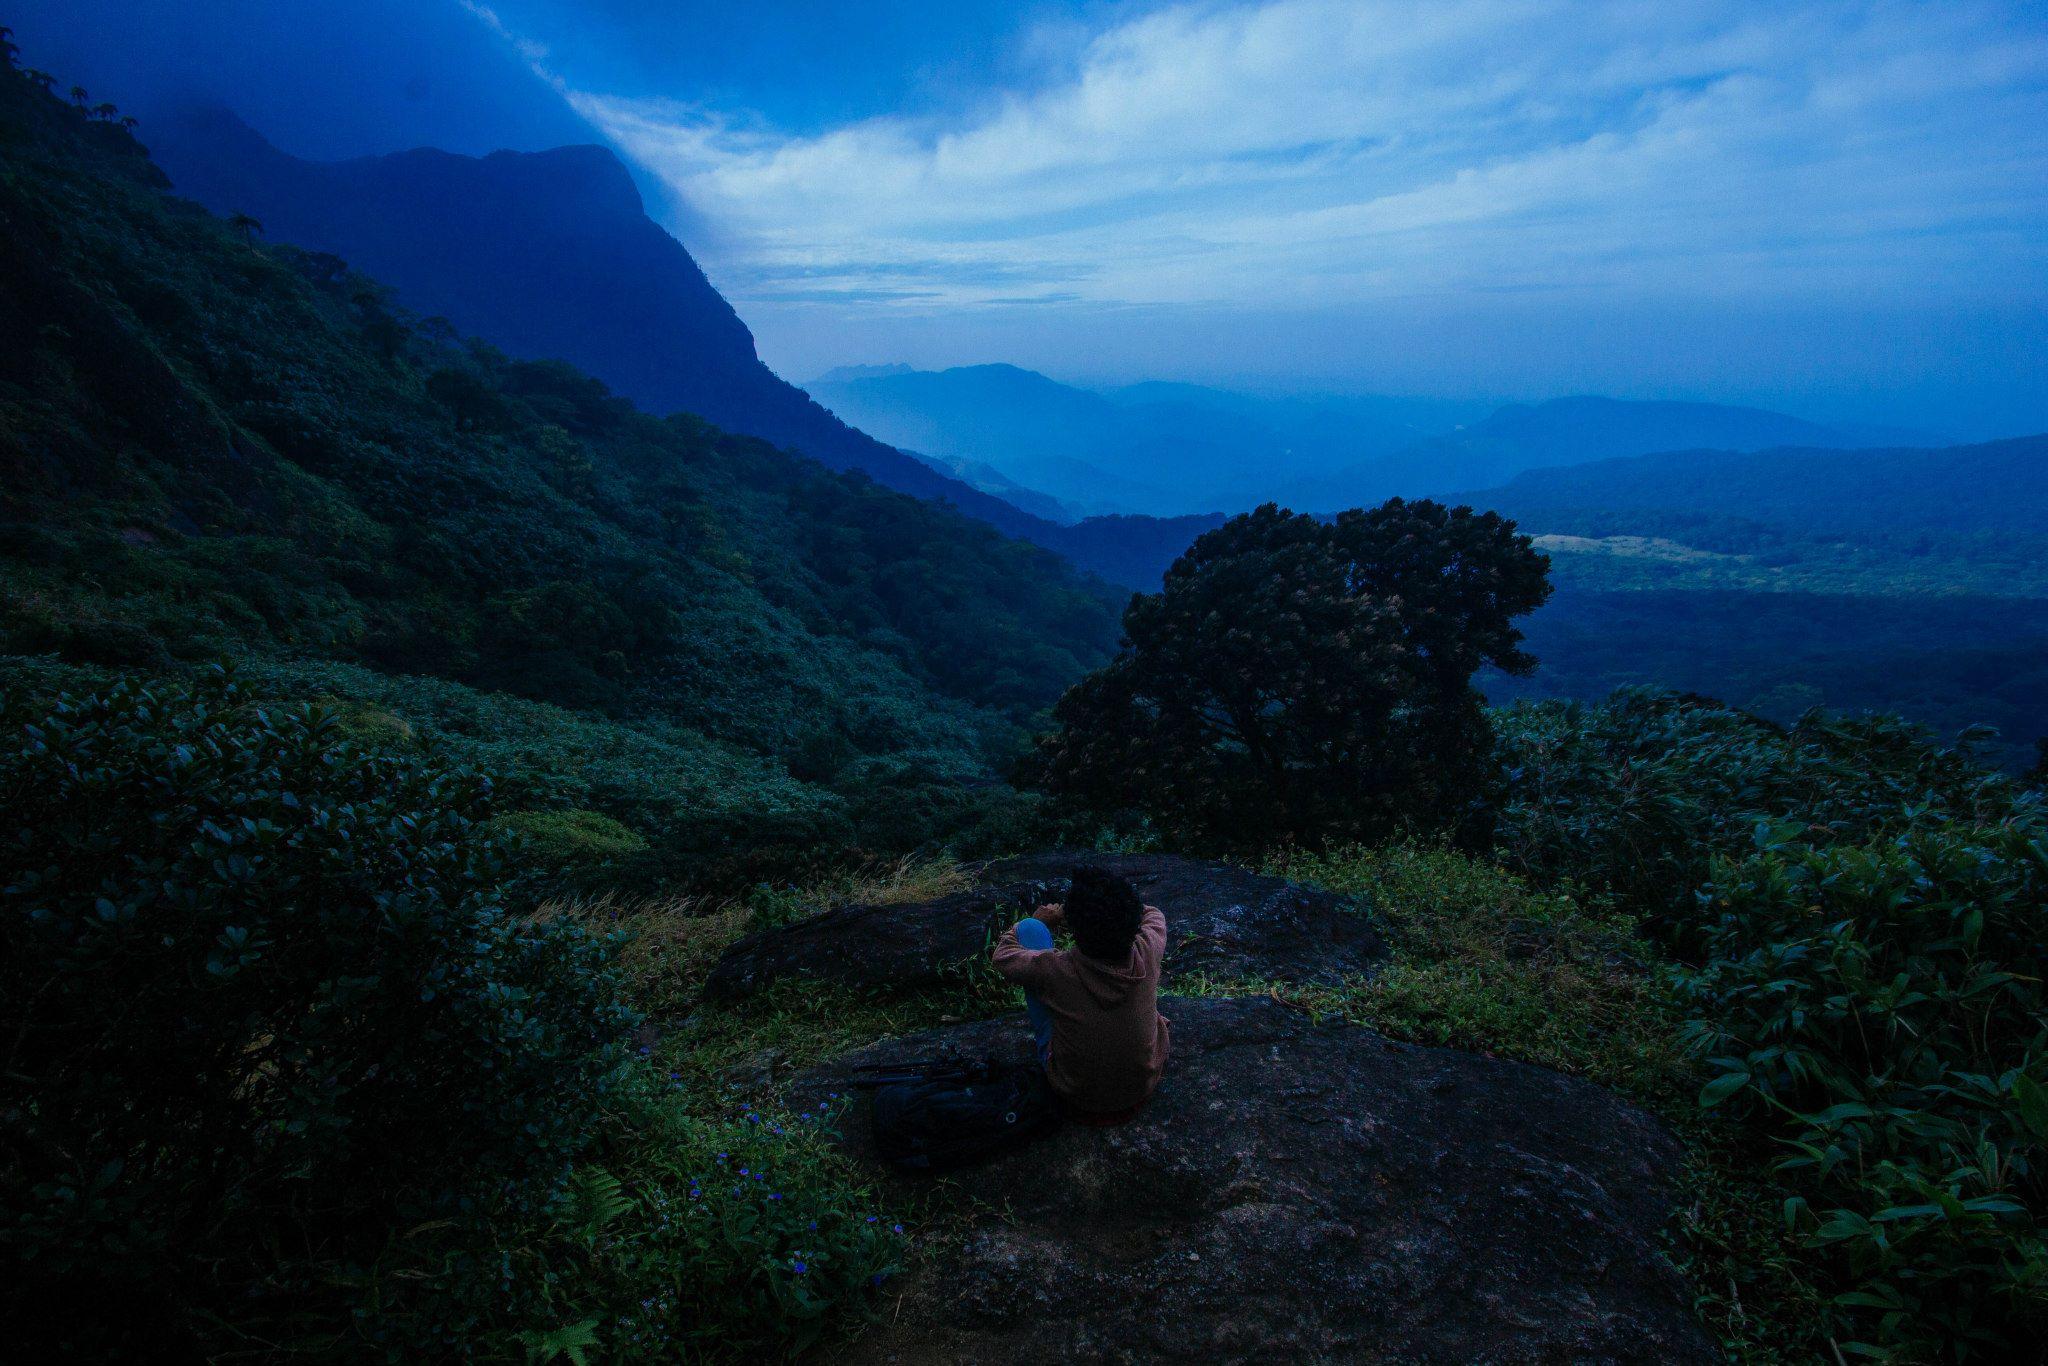 Agasthyarkoodam or Agasthyamalai Trekking route